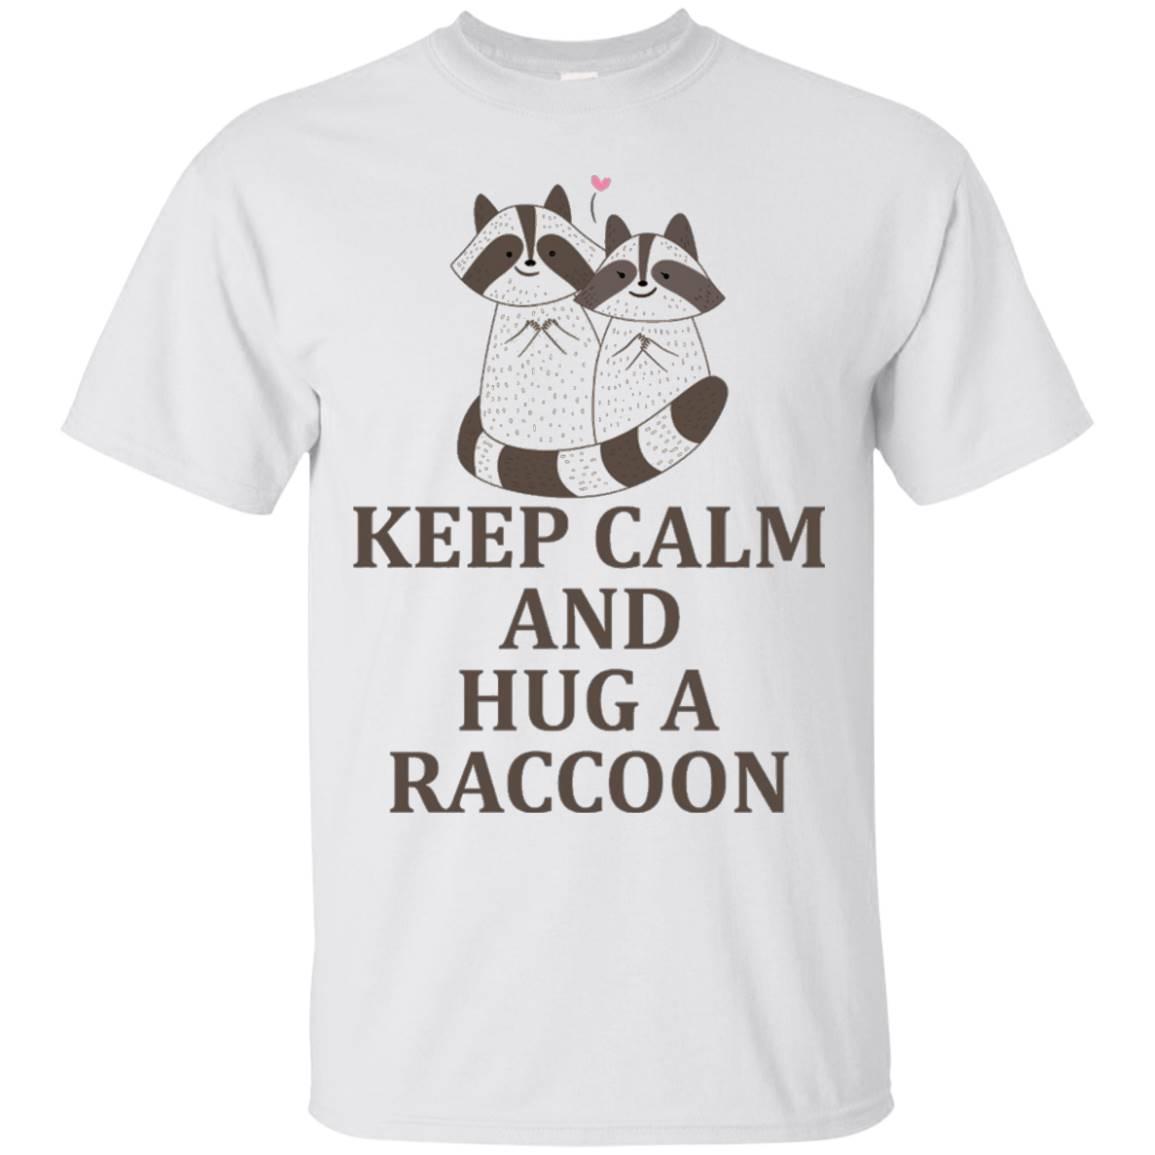 KEEP CALM AND HUG A RACCOON T-shirt